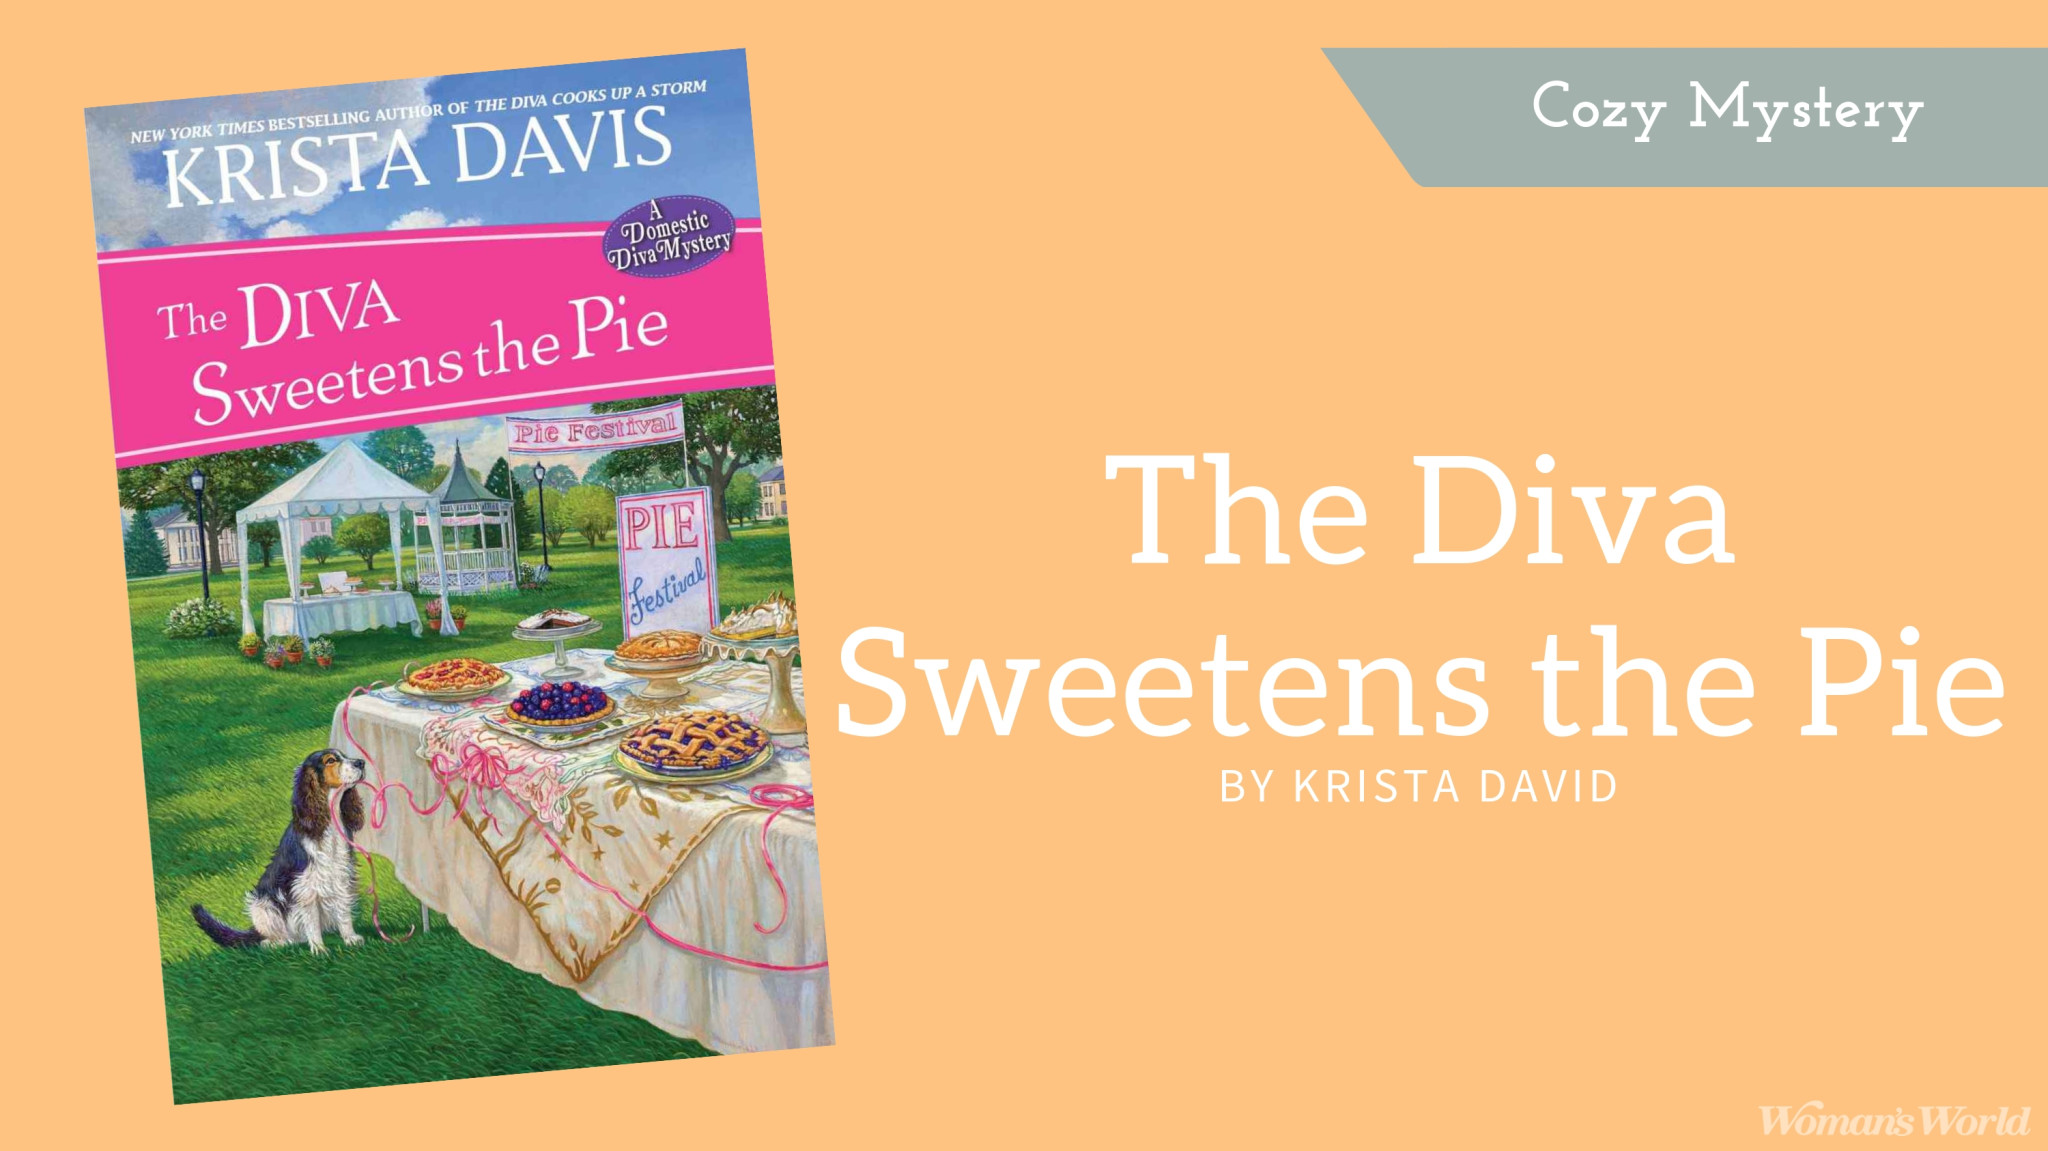 diva-sweetens-pie-book